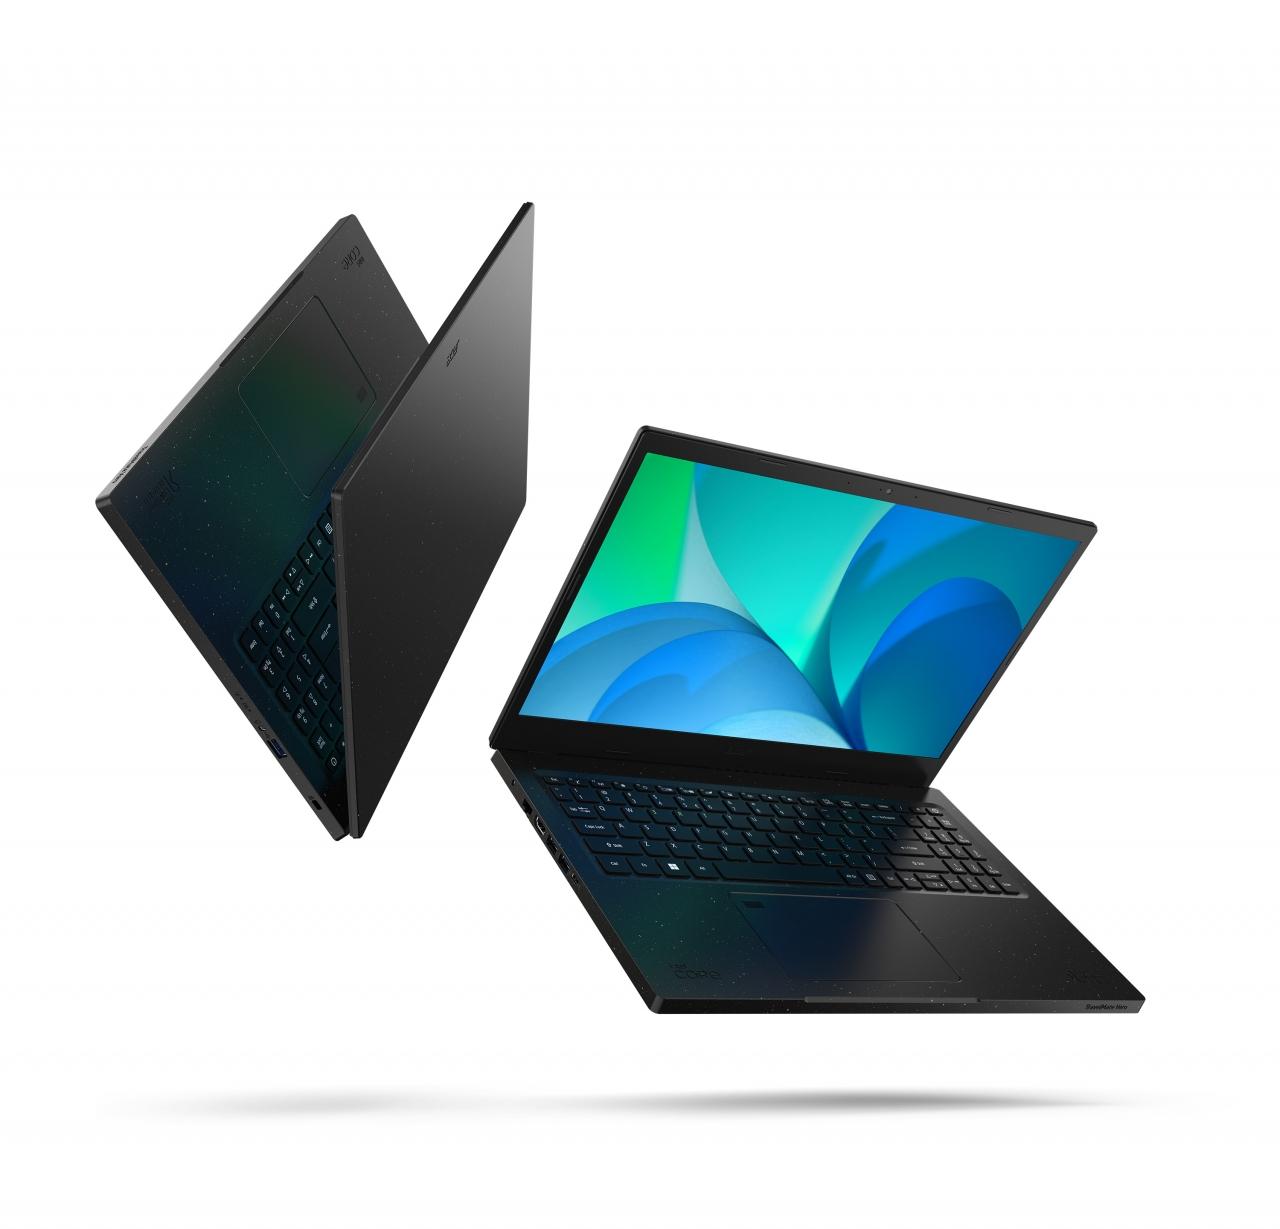 Acer TravelMate Vero (TMV15-51) Green Laptop